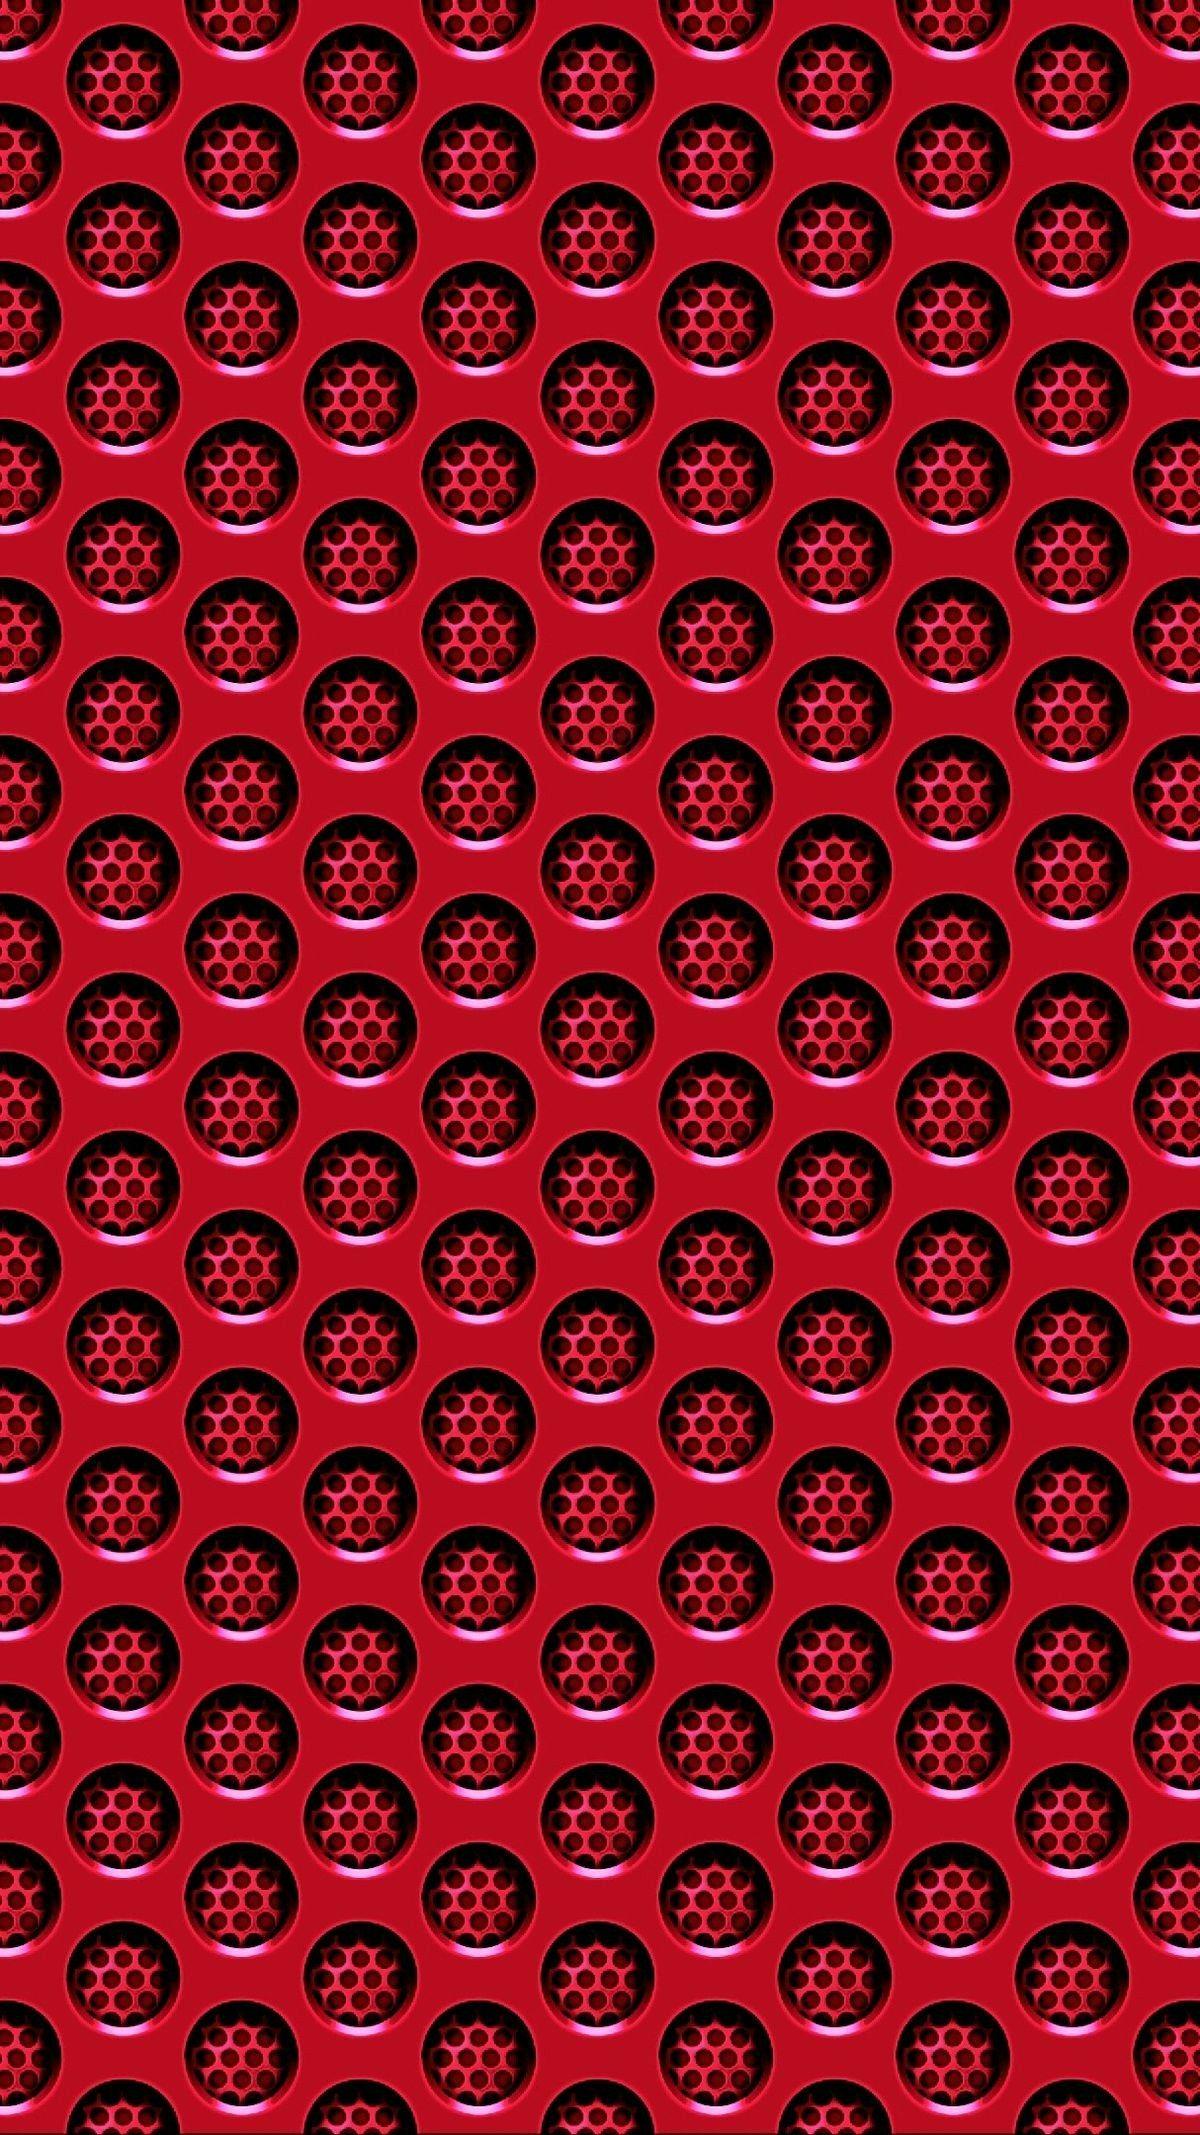 Wallpaper Red Red Wallpaper Adidas Wallpaper Backgrounds S8 Wallpaper